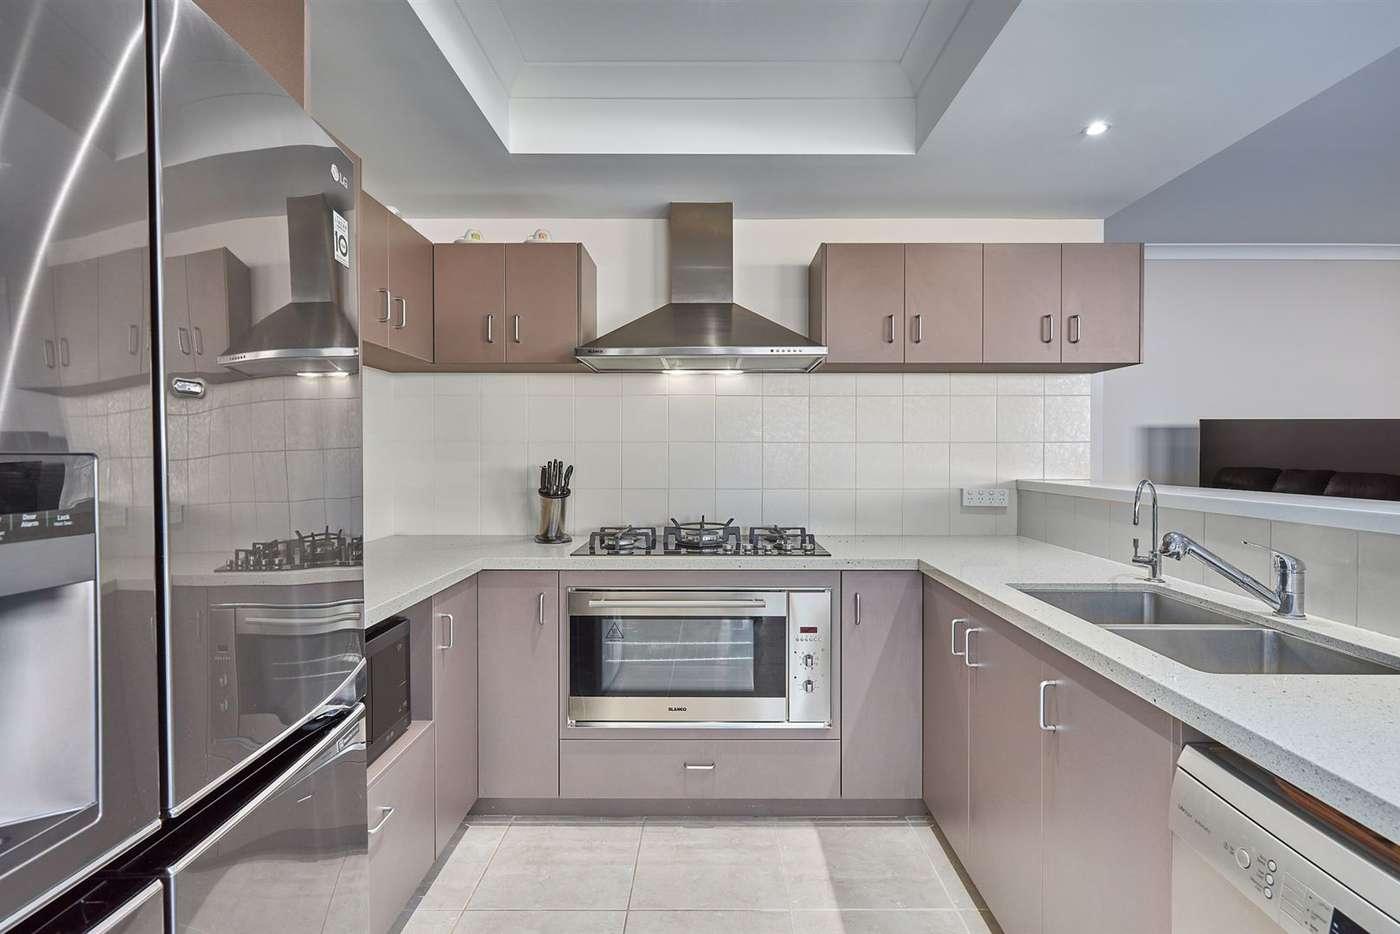 Sixth view of Homely house listing, 60 Birkett Ave, Beeliar WA 6164